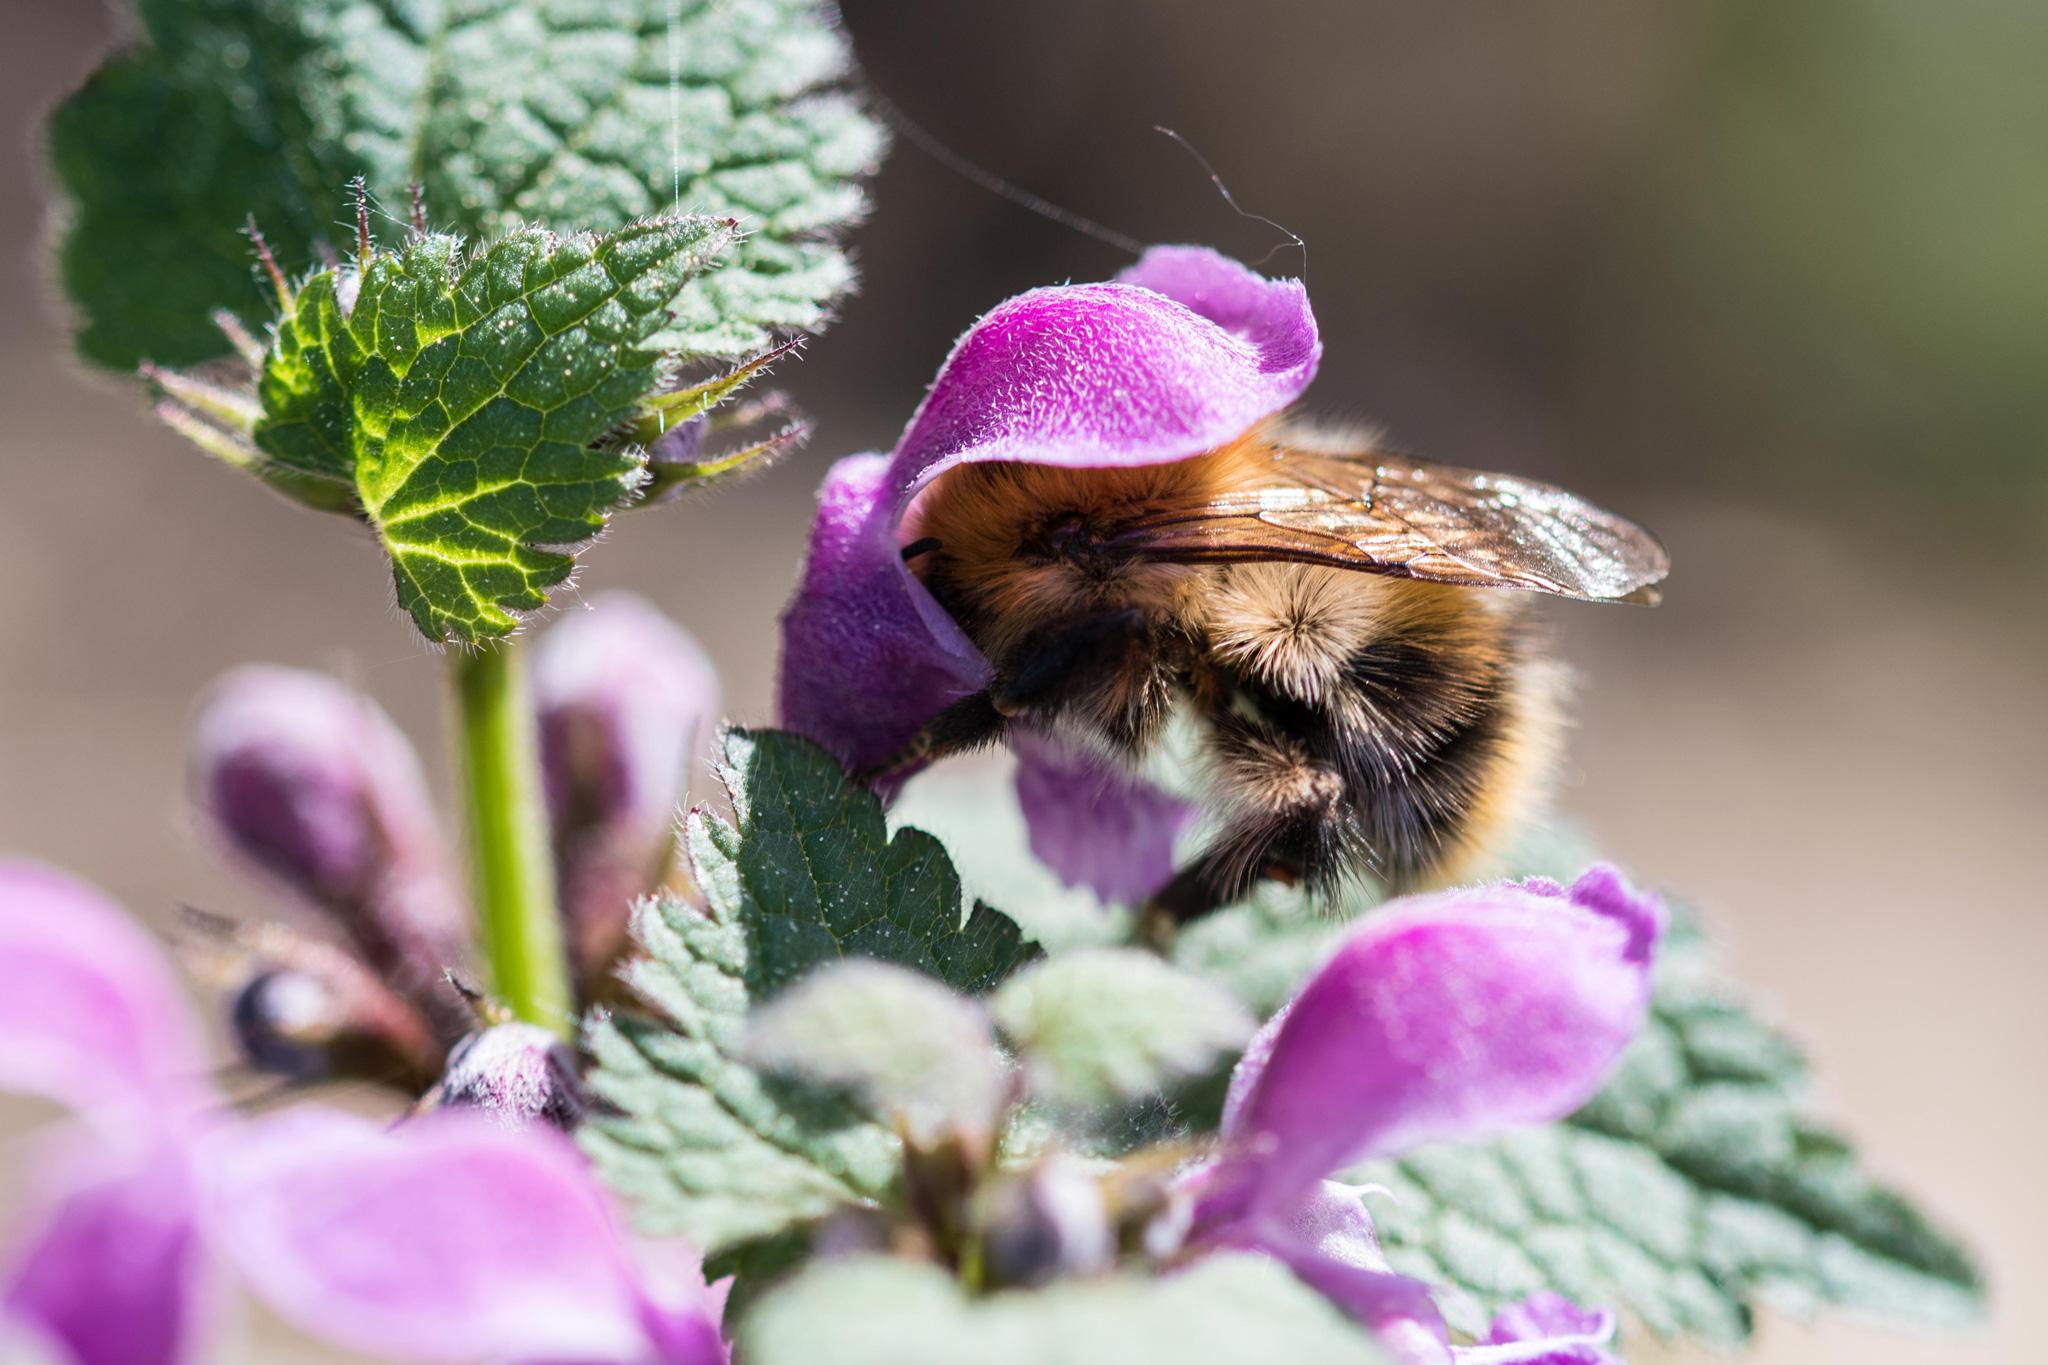 Pelzbiene in einer Blüte (Foto: Steffi Linke)